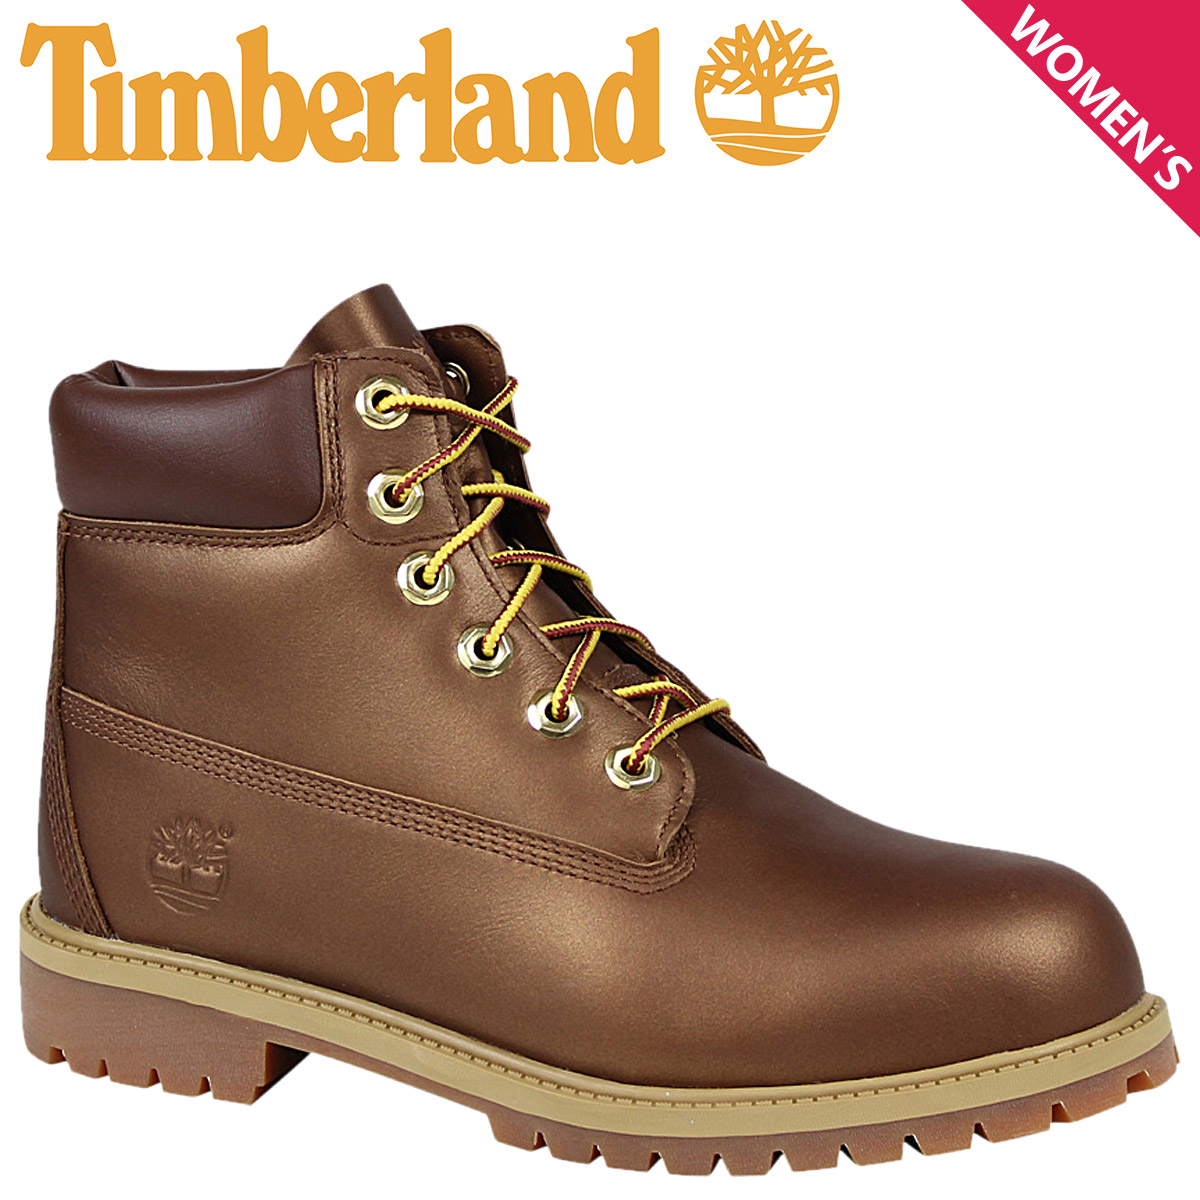 a65041dd9507 SneaK Online Shop  Timberland Womens boots timberland 6inch premium ...